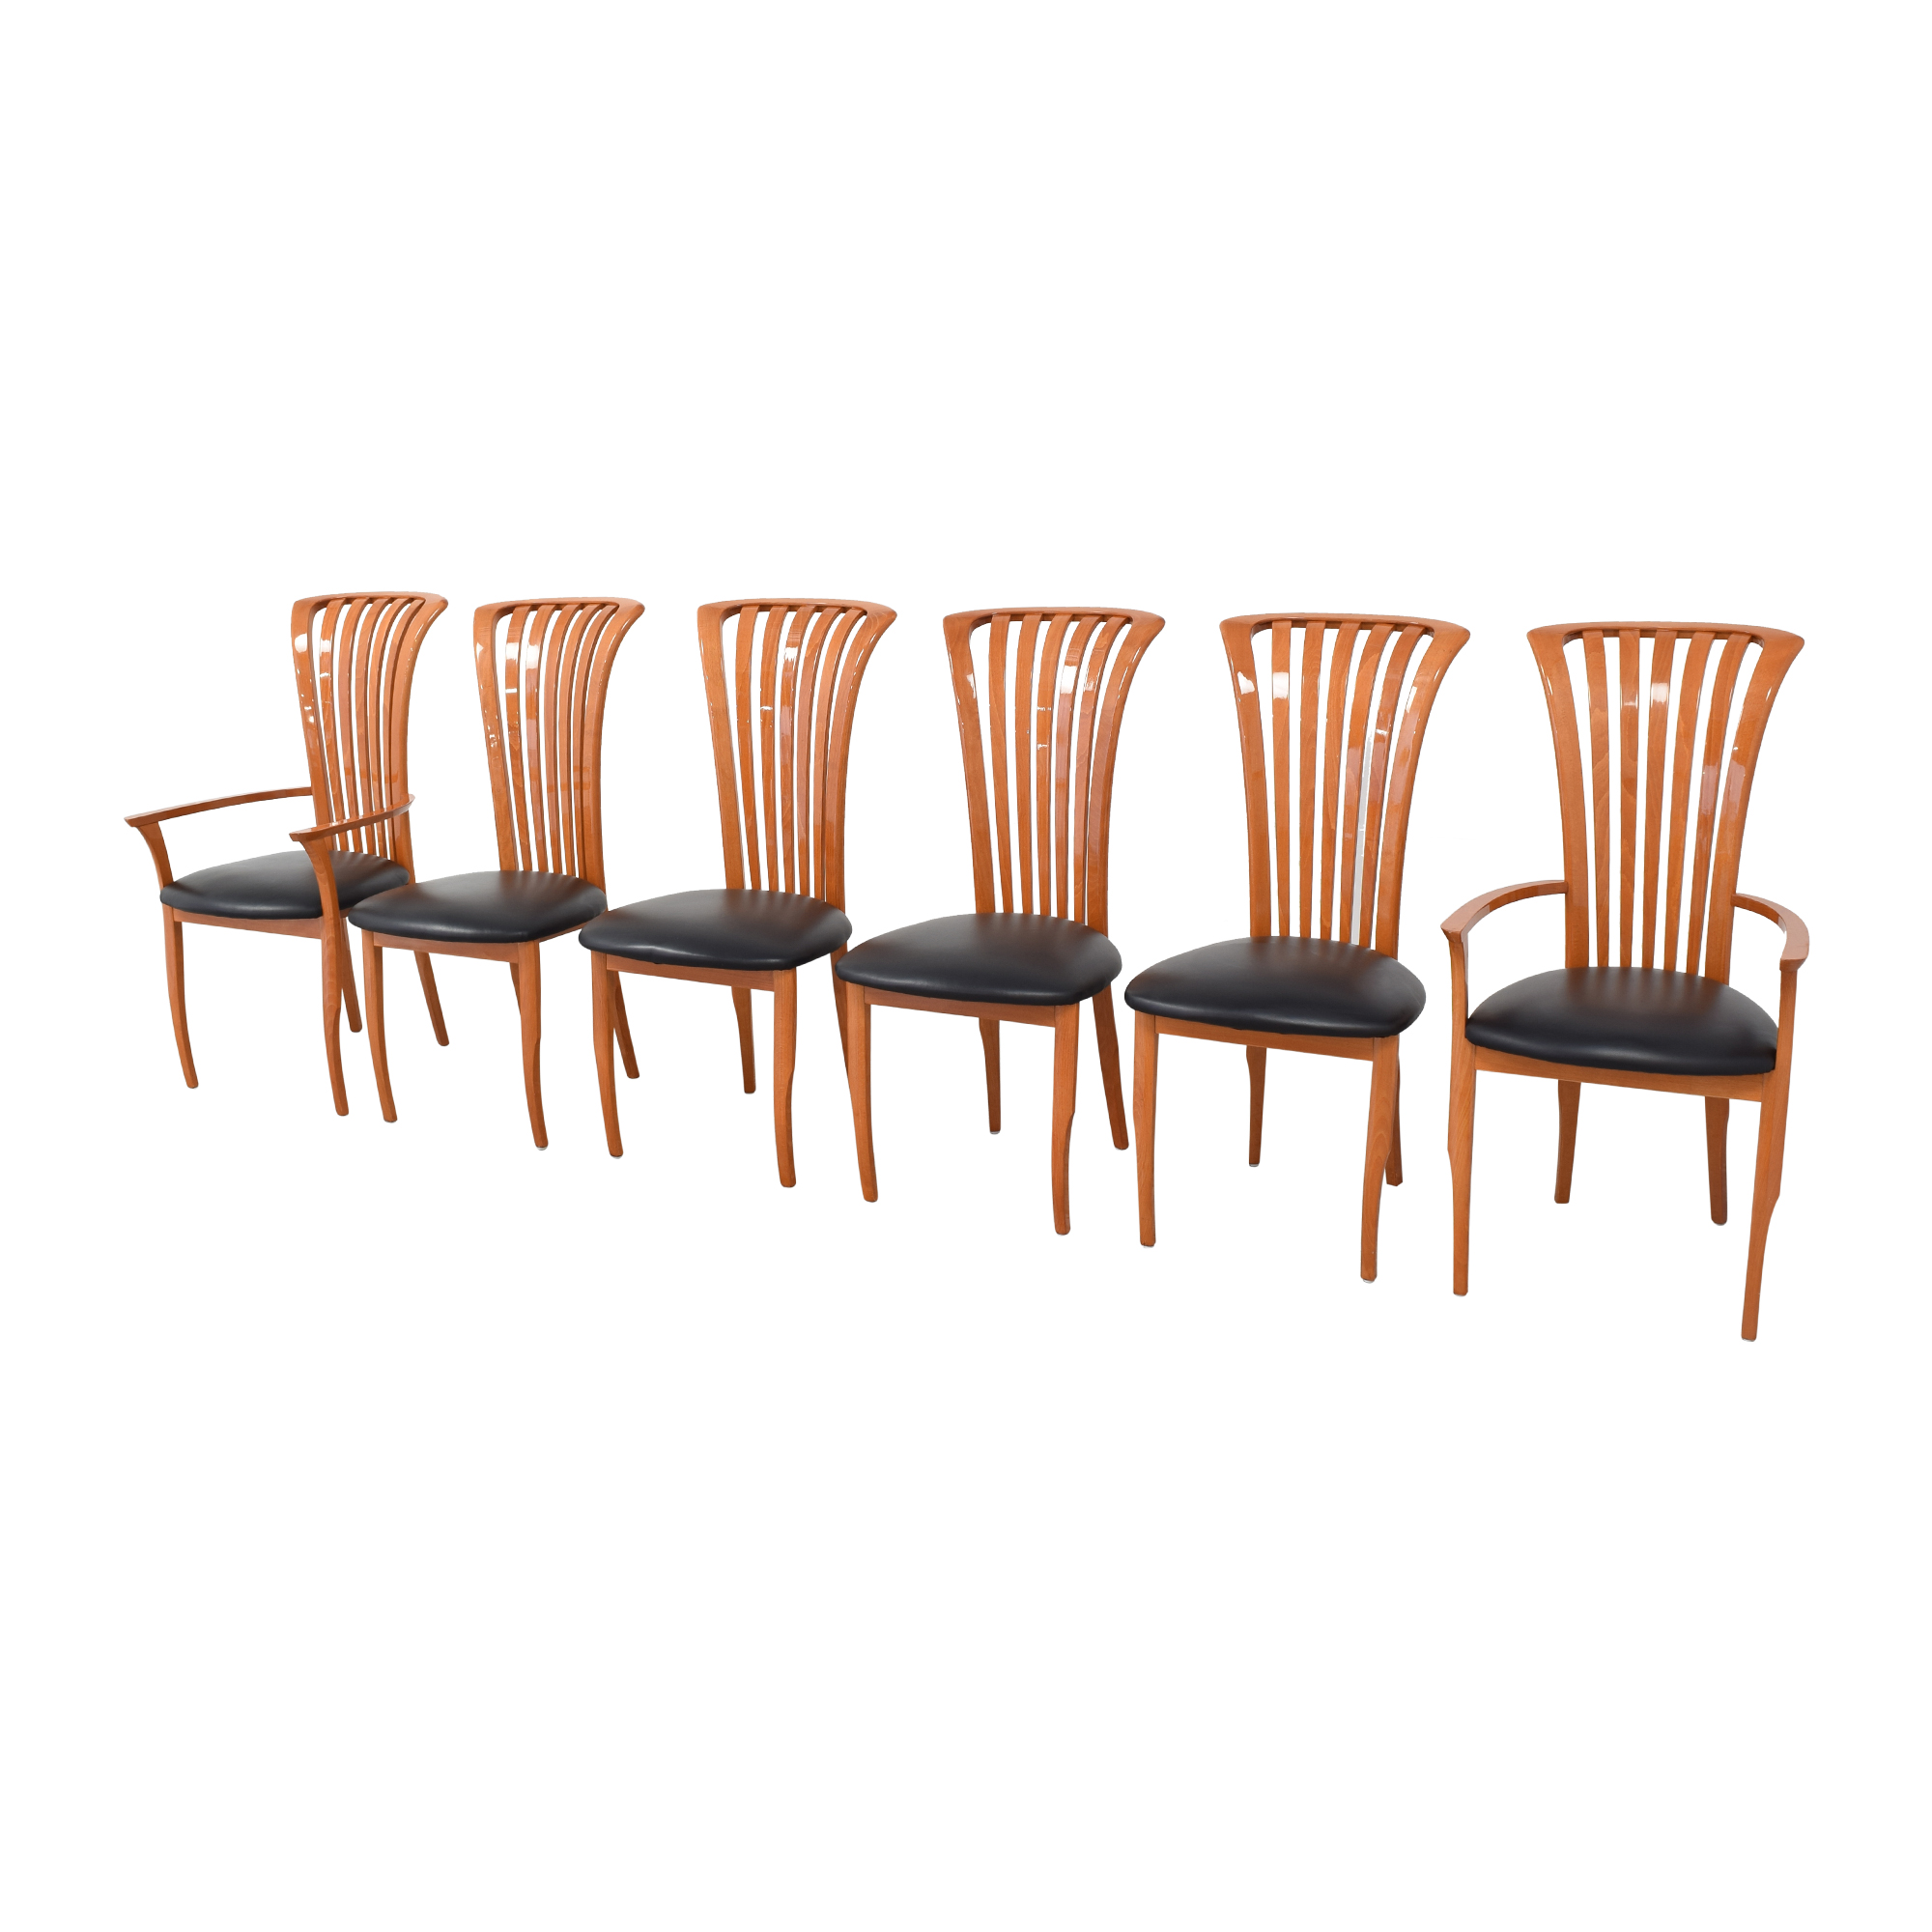 Pietro Costantini Pietro Costantini Modern Dining Chairs Chairs